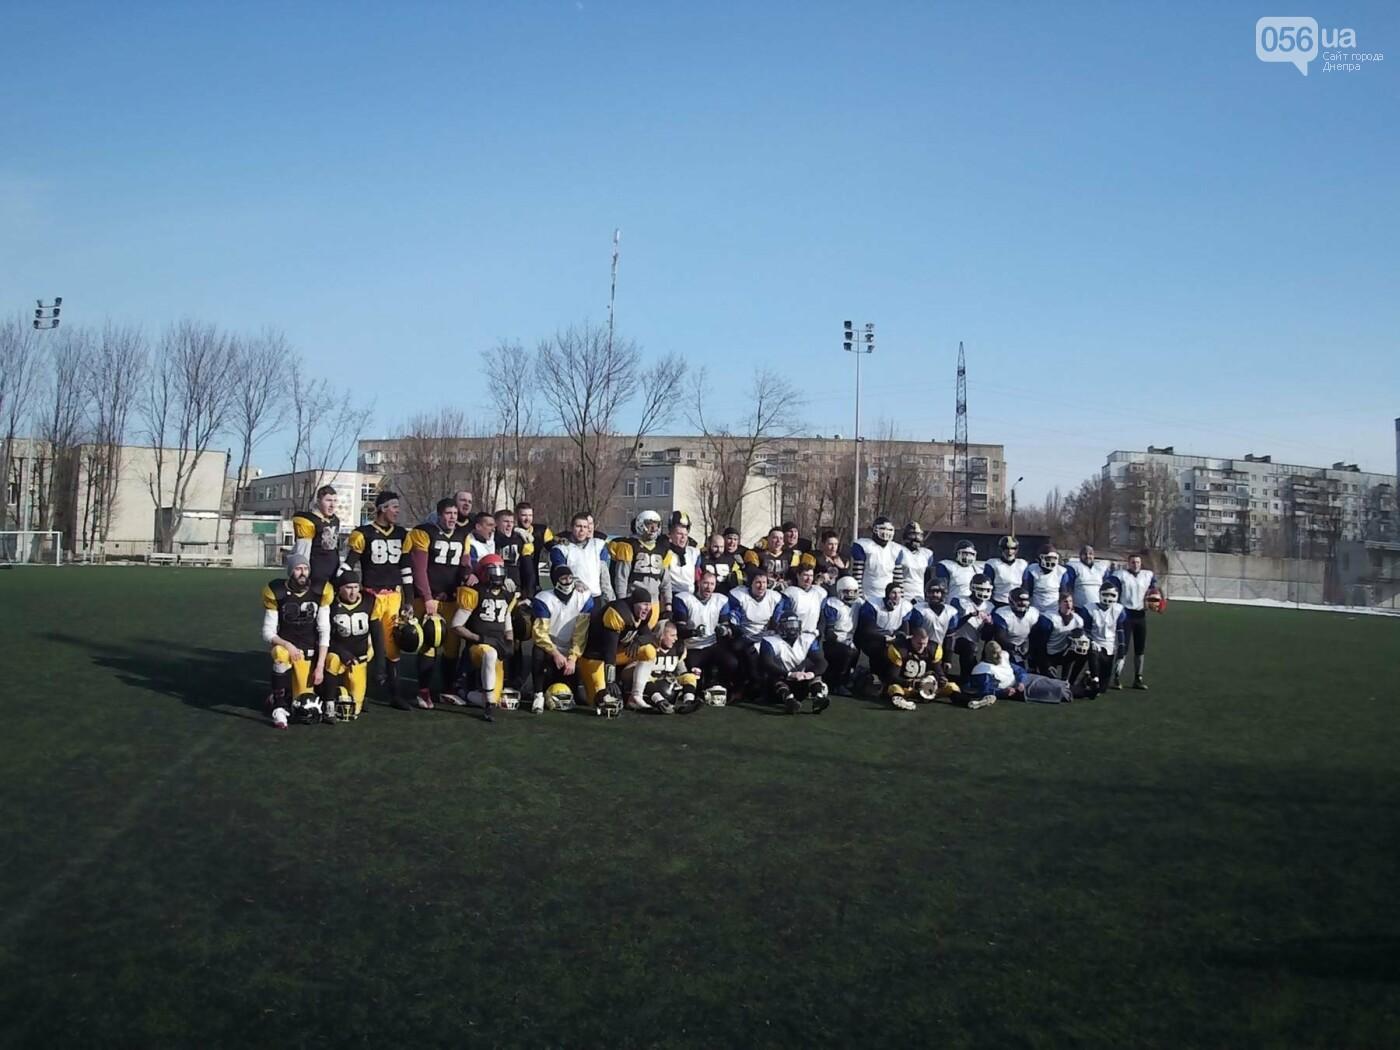 В Днепре открылся сезон американского футбола (ФОТО, ВИДЕО), фото-2